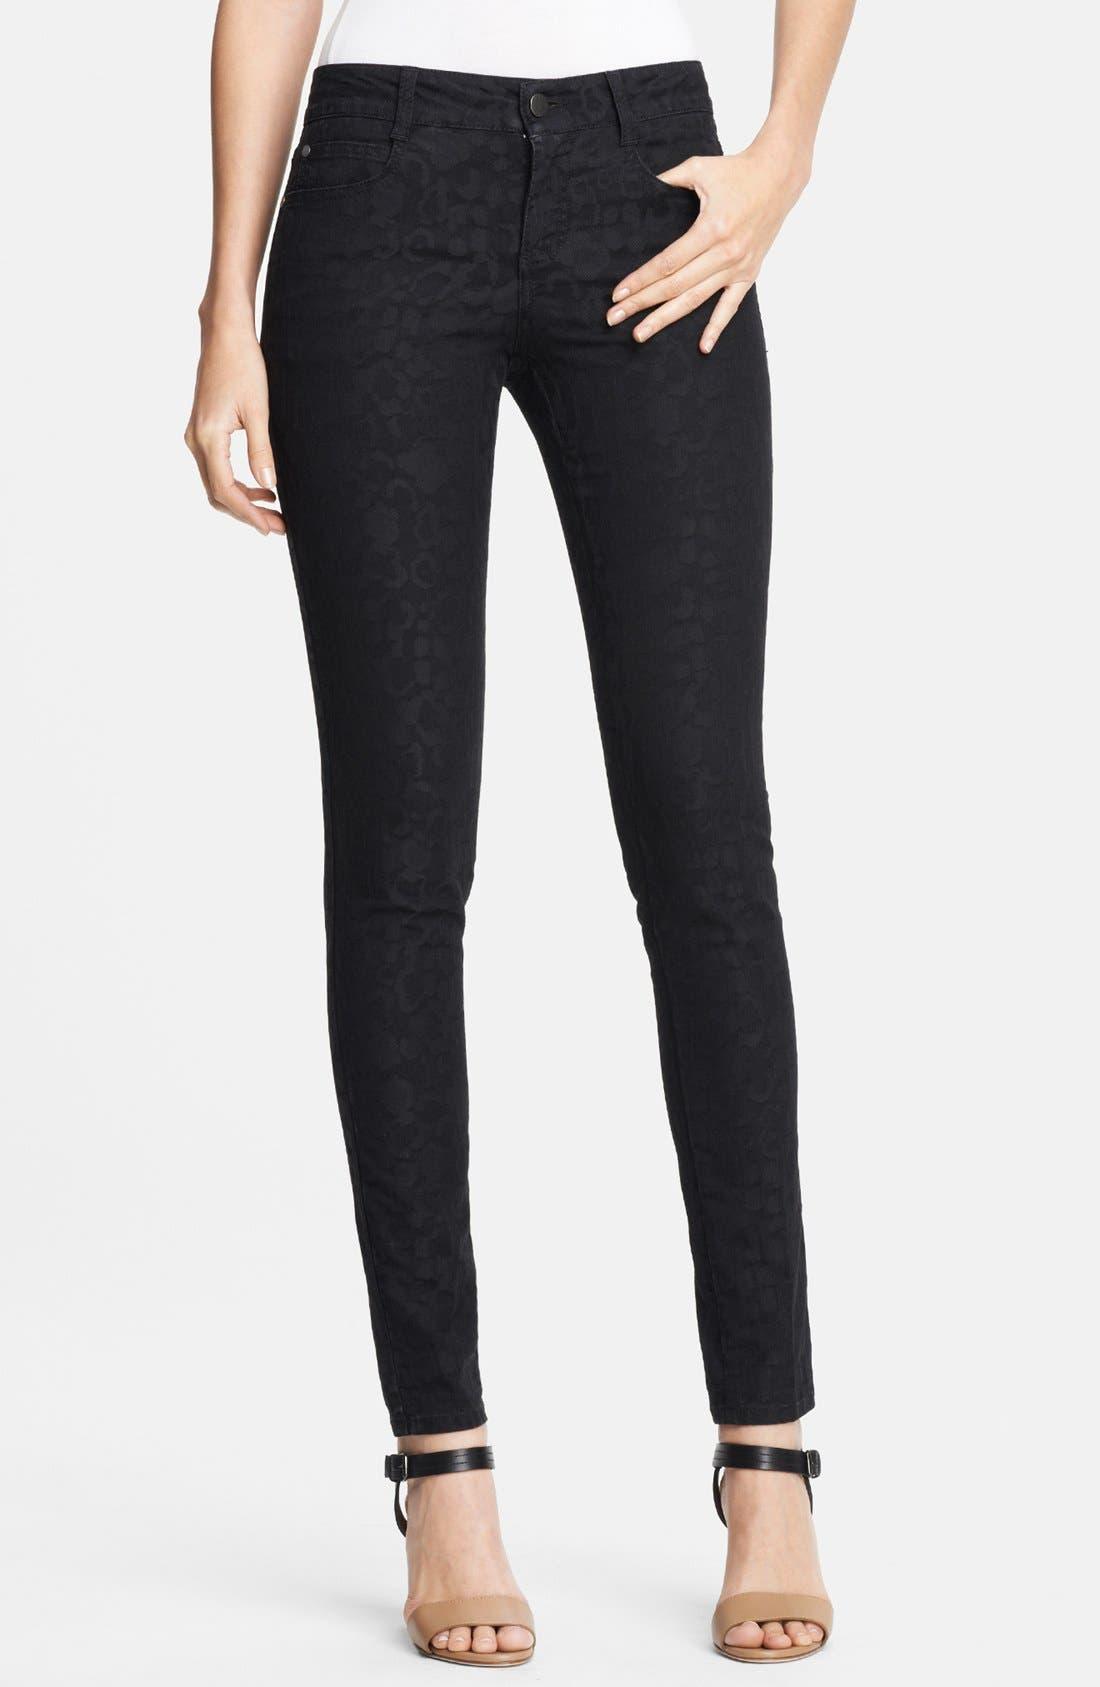 Alternate Image 1 Selected - Stella McCartney 'Lina' Leopard Jacquard Skinny Jeans